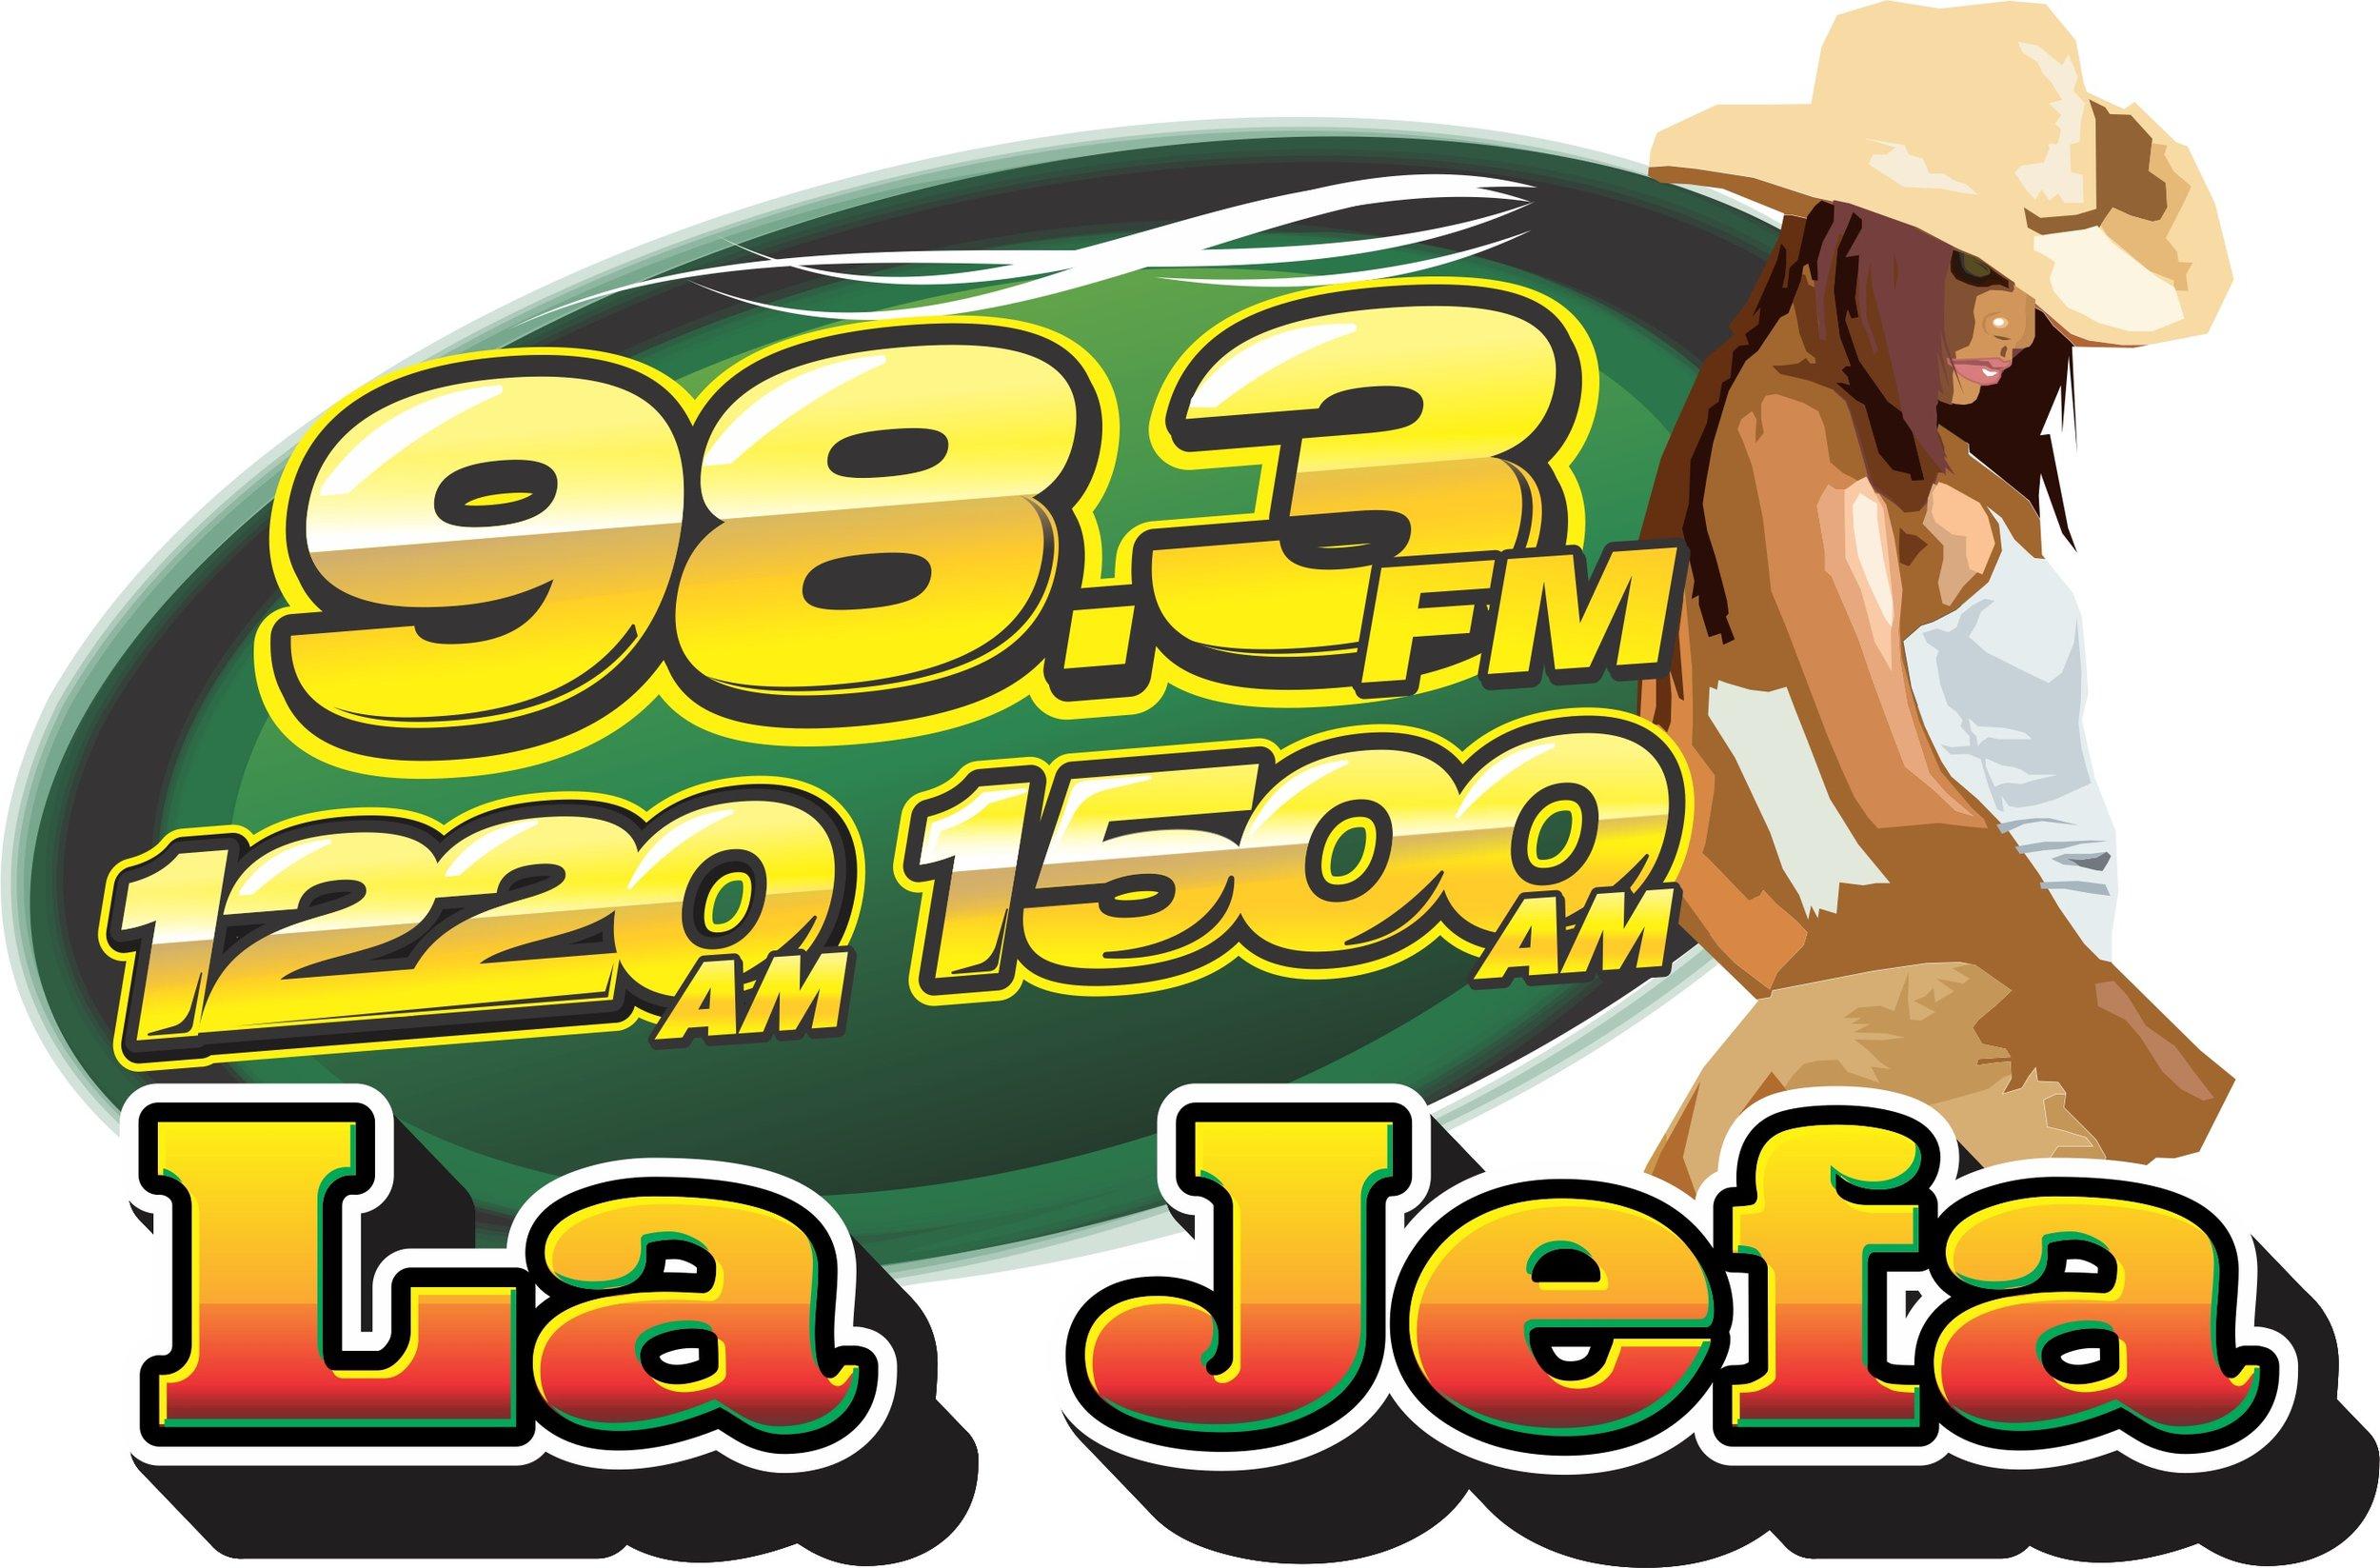 La_Jefa_983_1220_1500_Offical_2017_Logo.jpg